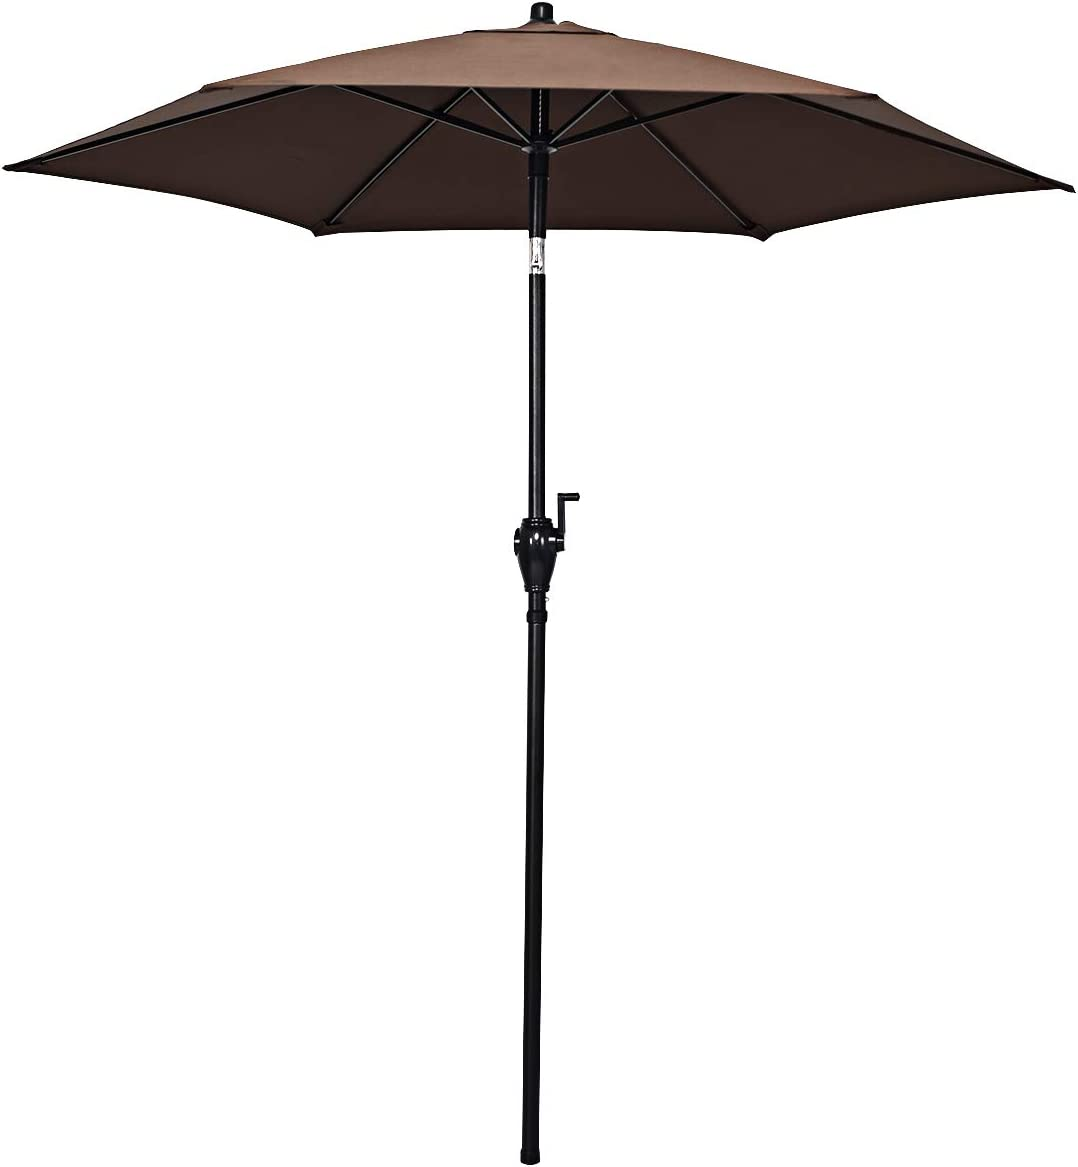 Tangkula 6.6ft Outdoor Patio Umbrella, Garden Market Push Button Tilt and Crank 6 Ribs, Brown